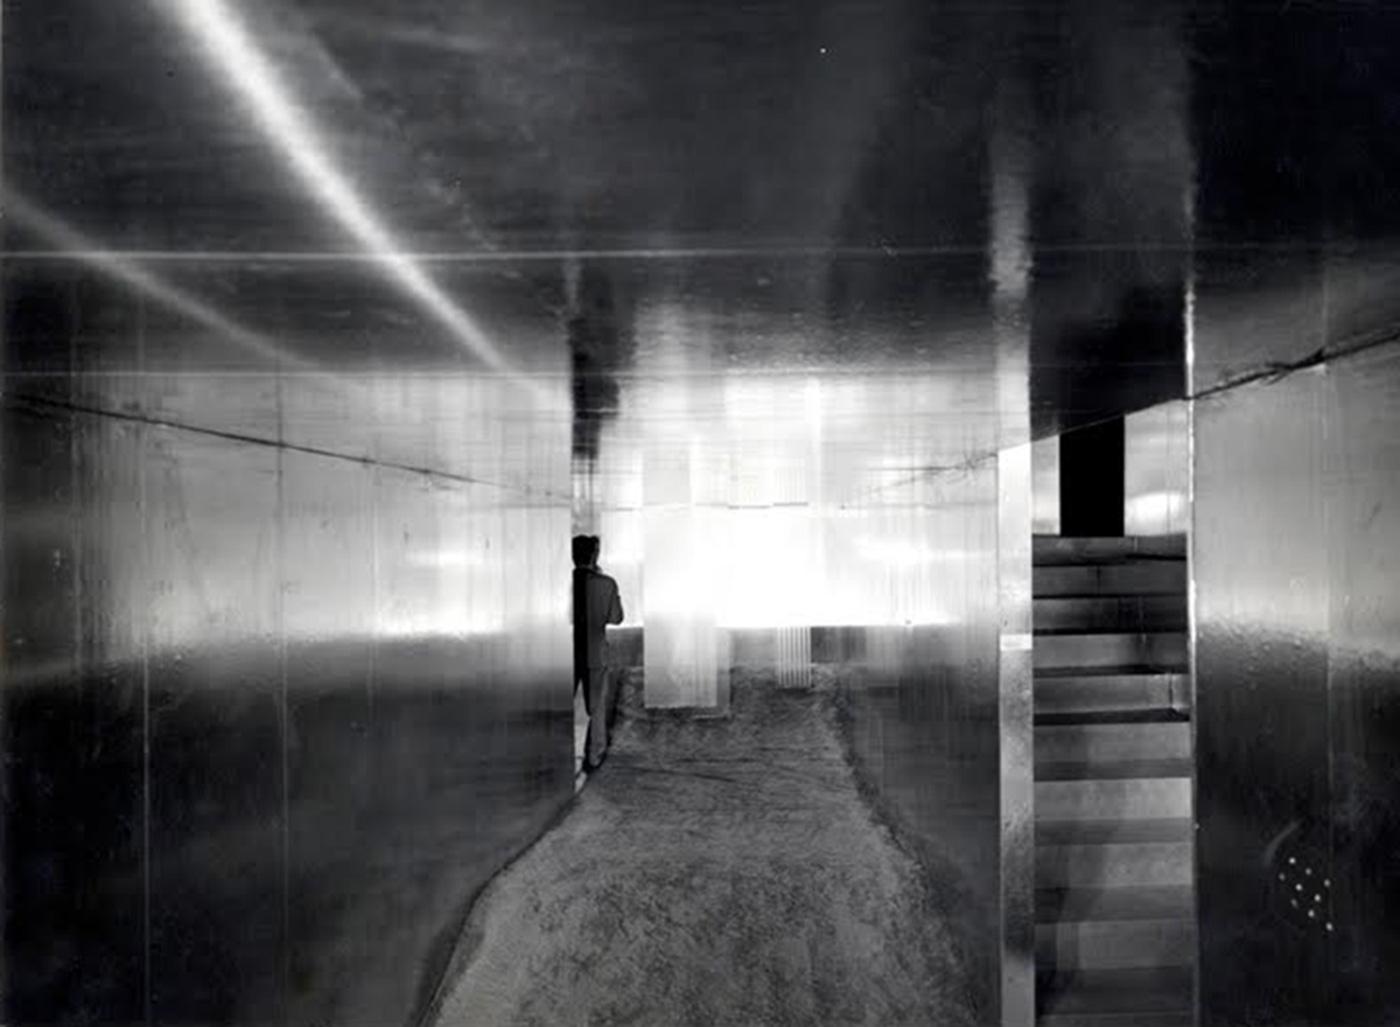 Lucio Fontana and Natanda Vigo, Utopie, 1964, courtesy Triennale of Milan